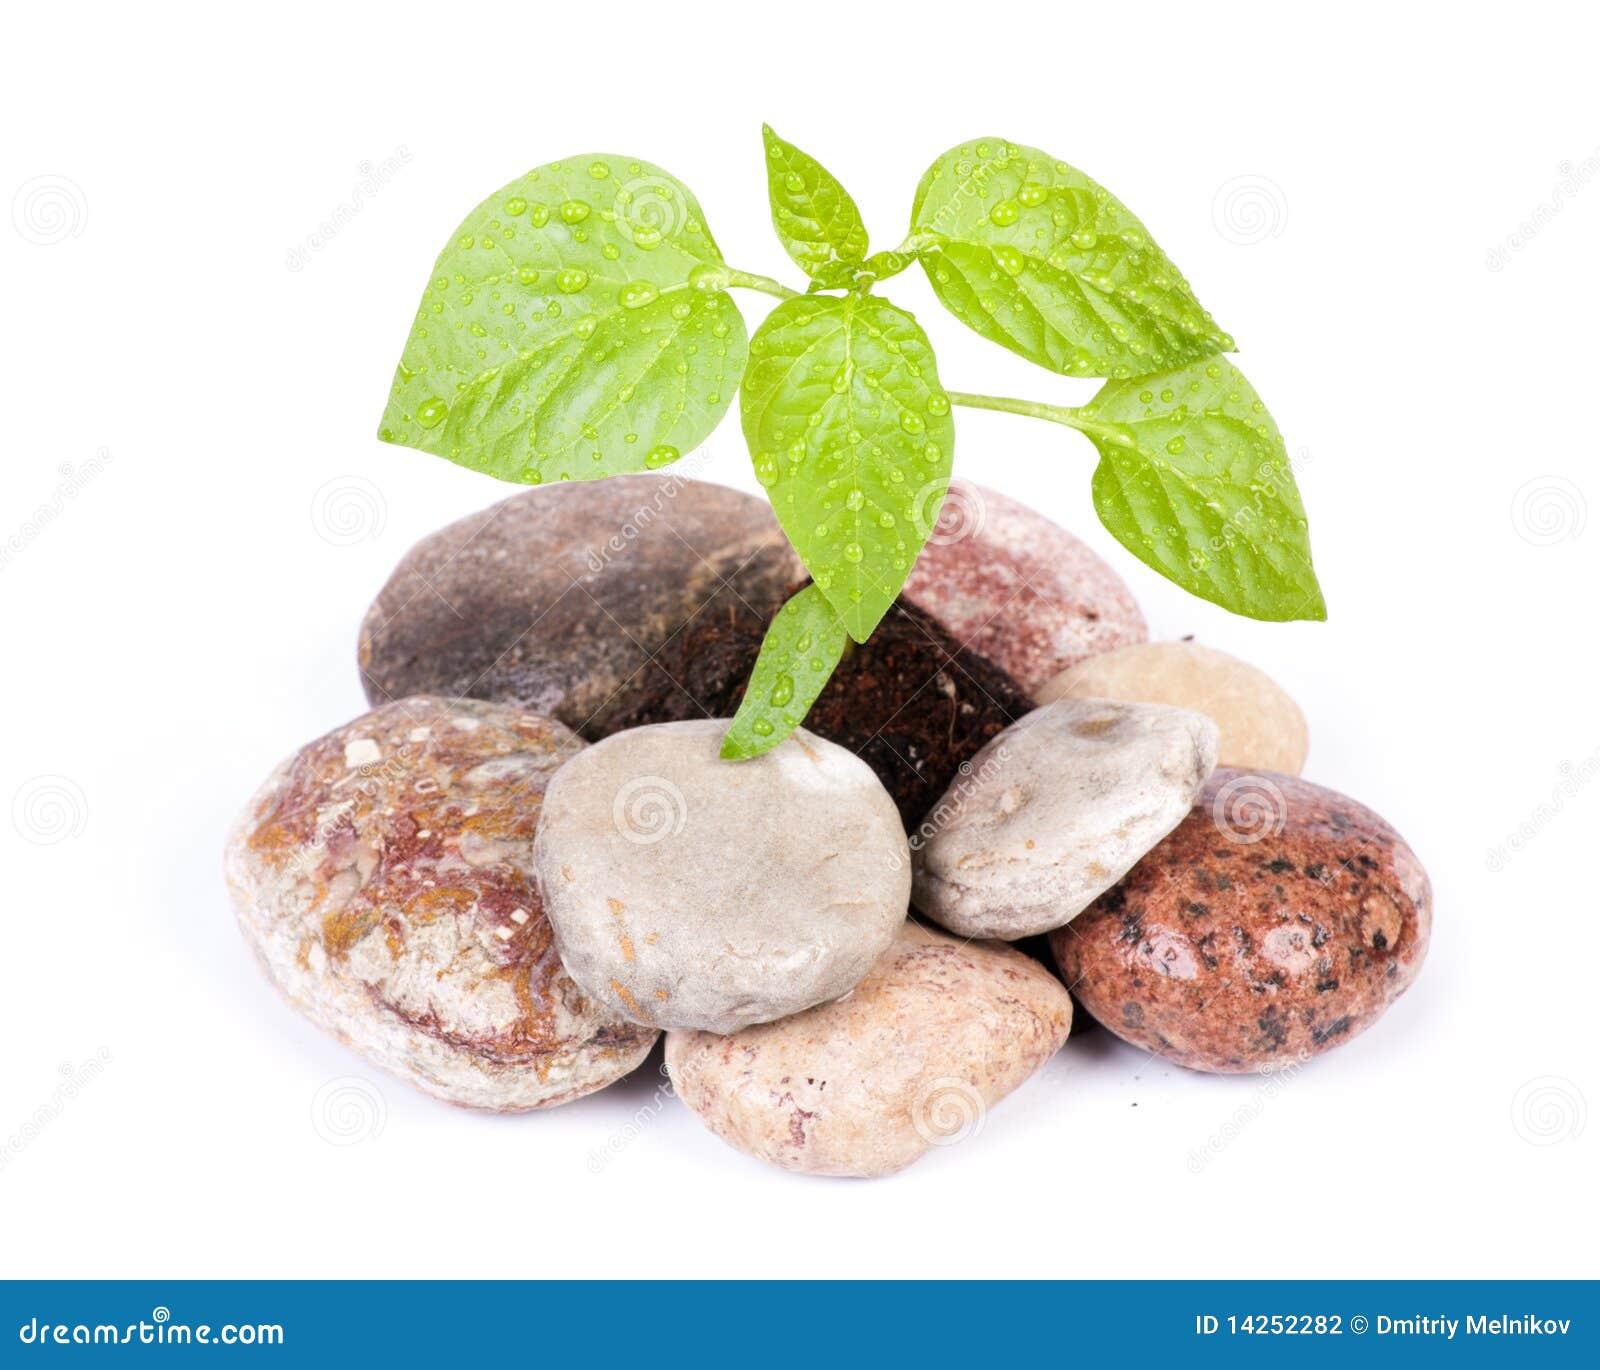 Sprout verde pequeno entre pedras